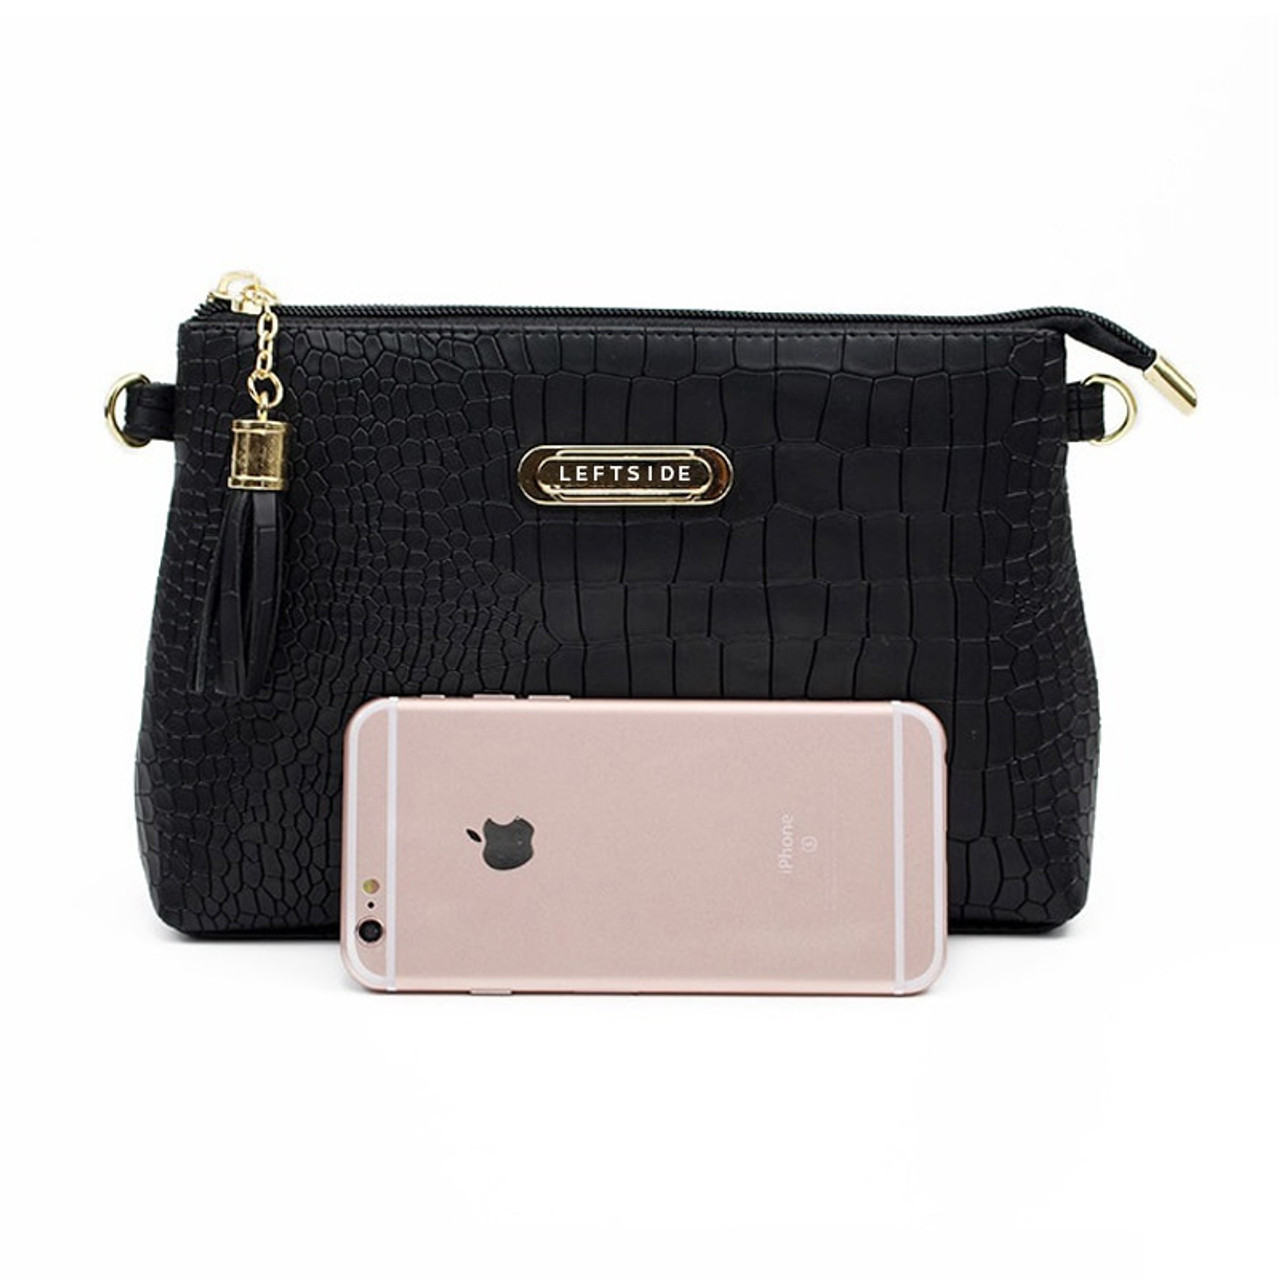 ... women famous brand fashion tassel Small Handbags Hot sale crocodile  women leather messenger bags Shoulder mini ... 890a917772d40